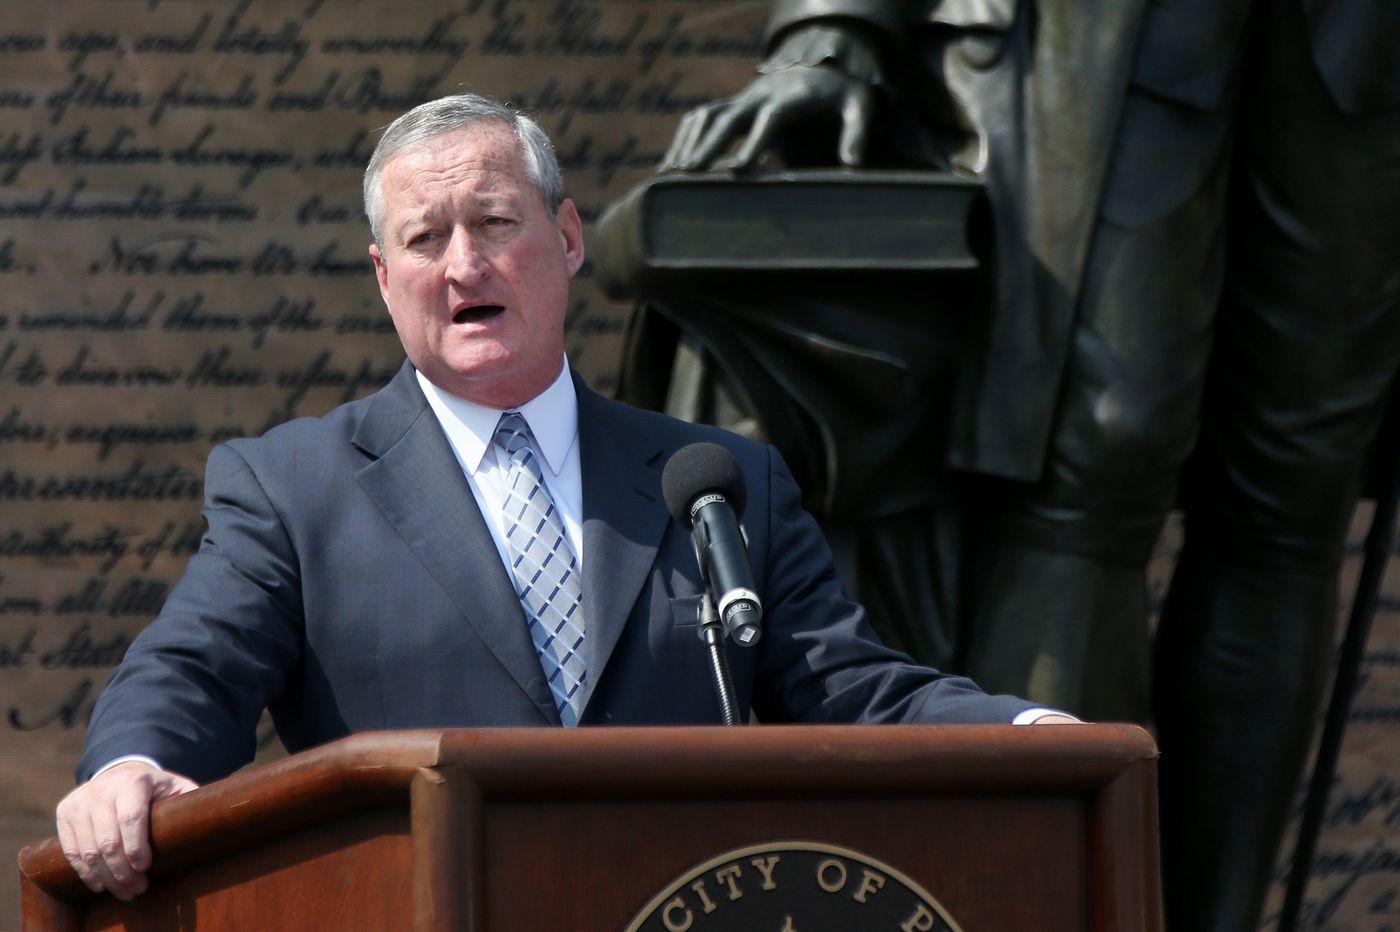 Mayor Kenney won't renew Philadelphia's data-sharing contract with ICE